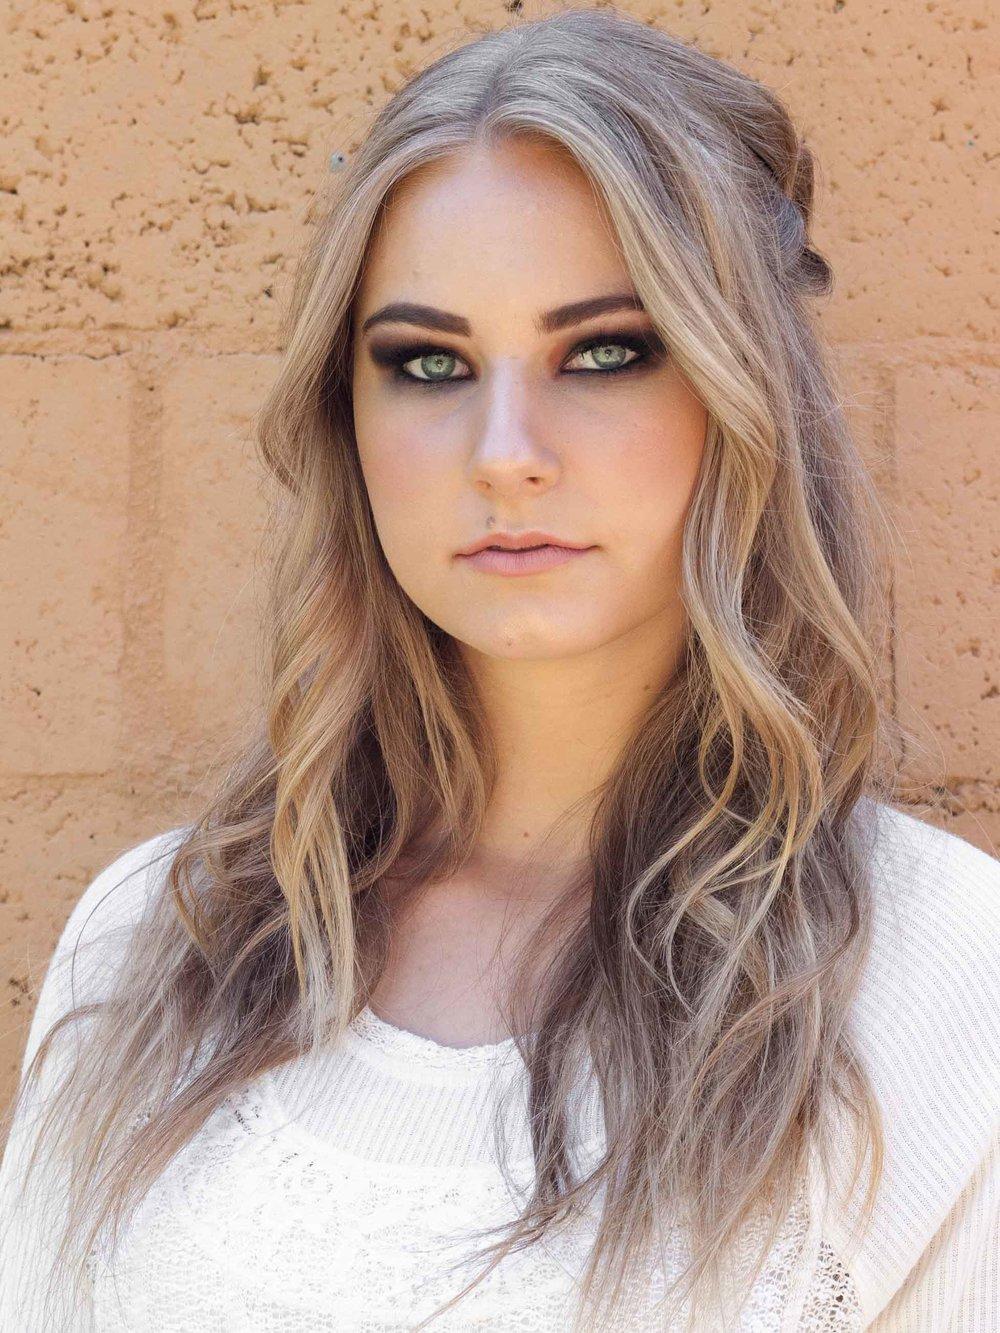 talia-whatcott-makeup-artist-portfolio-blog-hair-waterfall-braid-smoky-eye-matte-lip-bridal-wedding-tousled-curls-1-6.jpg